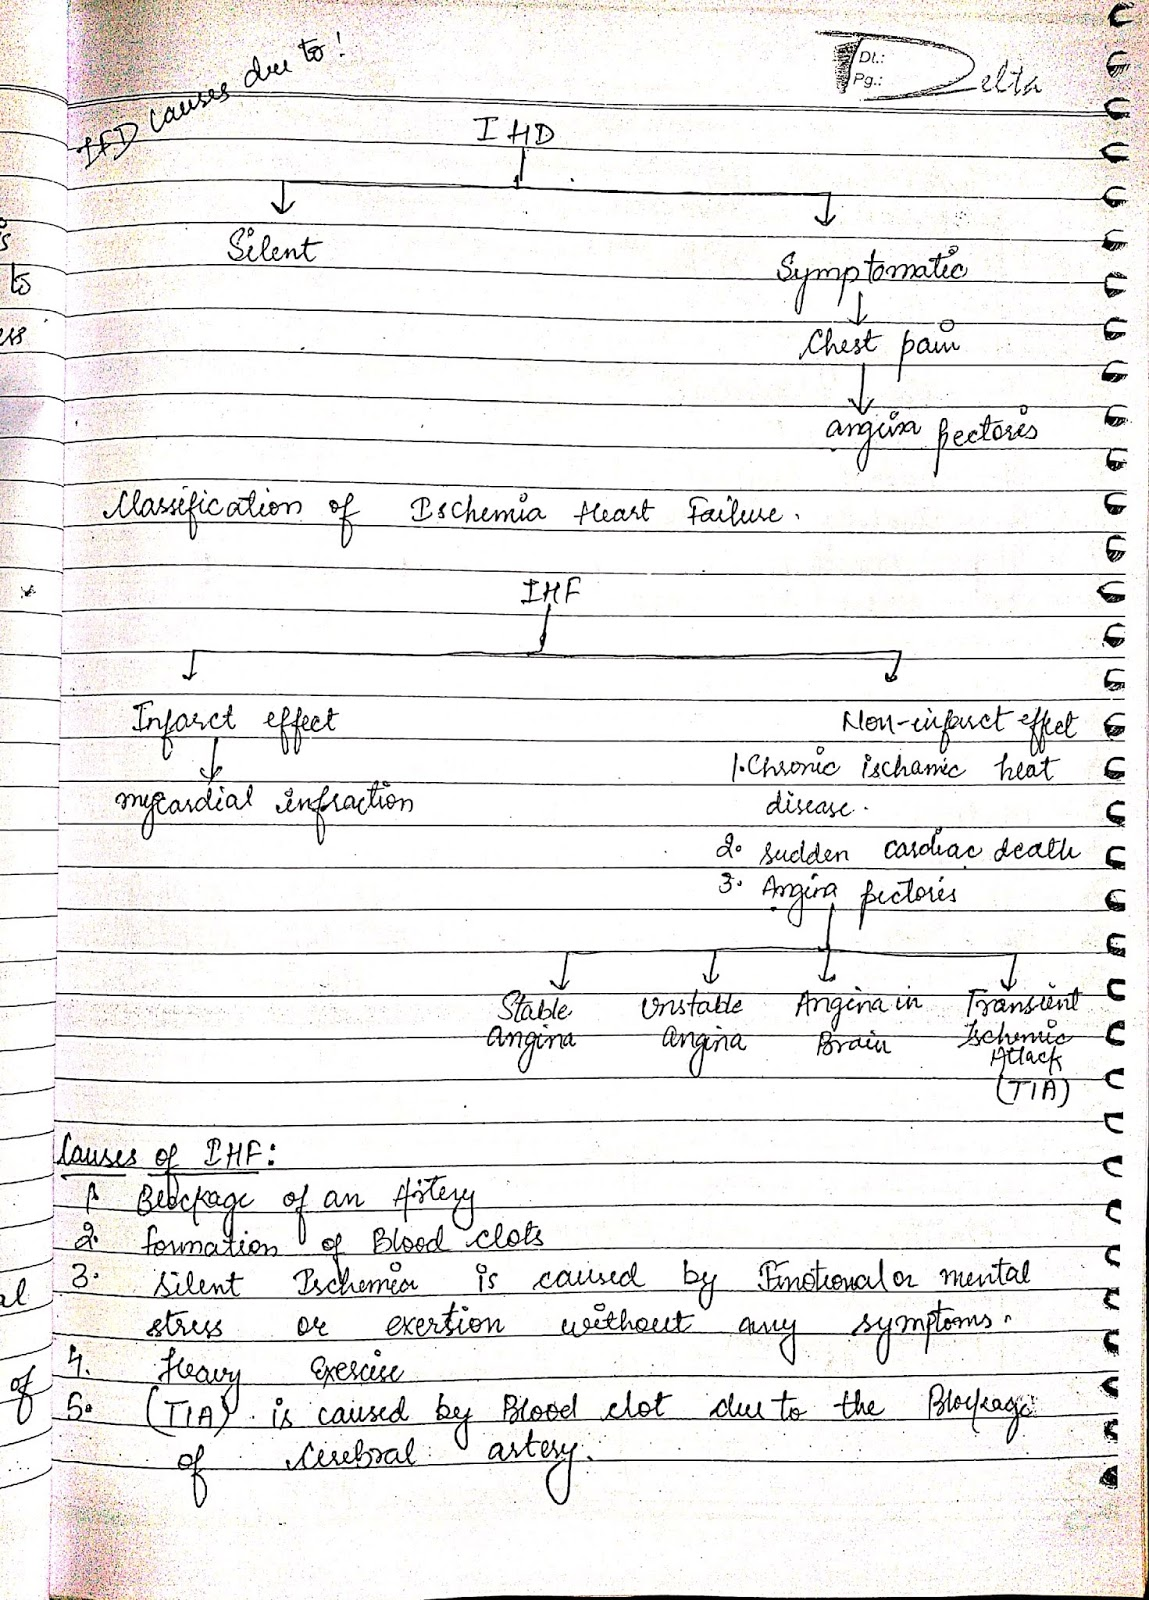 pathophysiology - Congestive heart failure CHR ischemic heart diseases